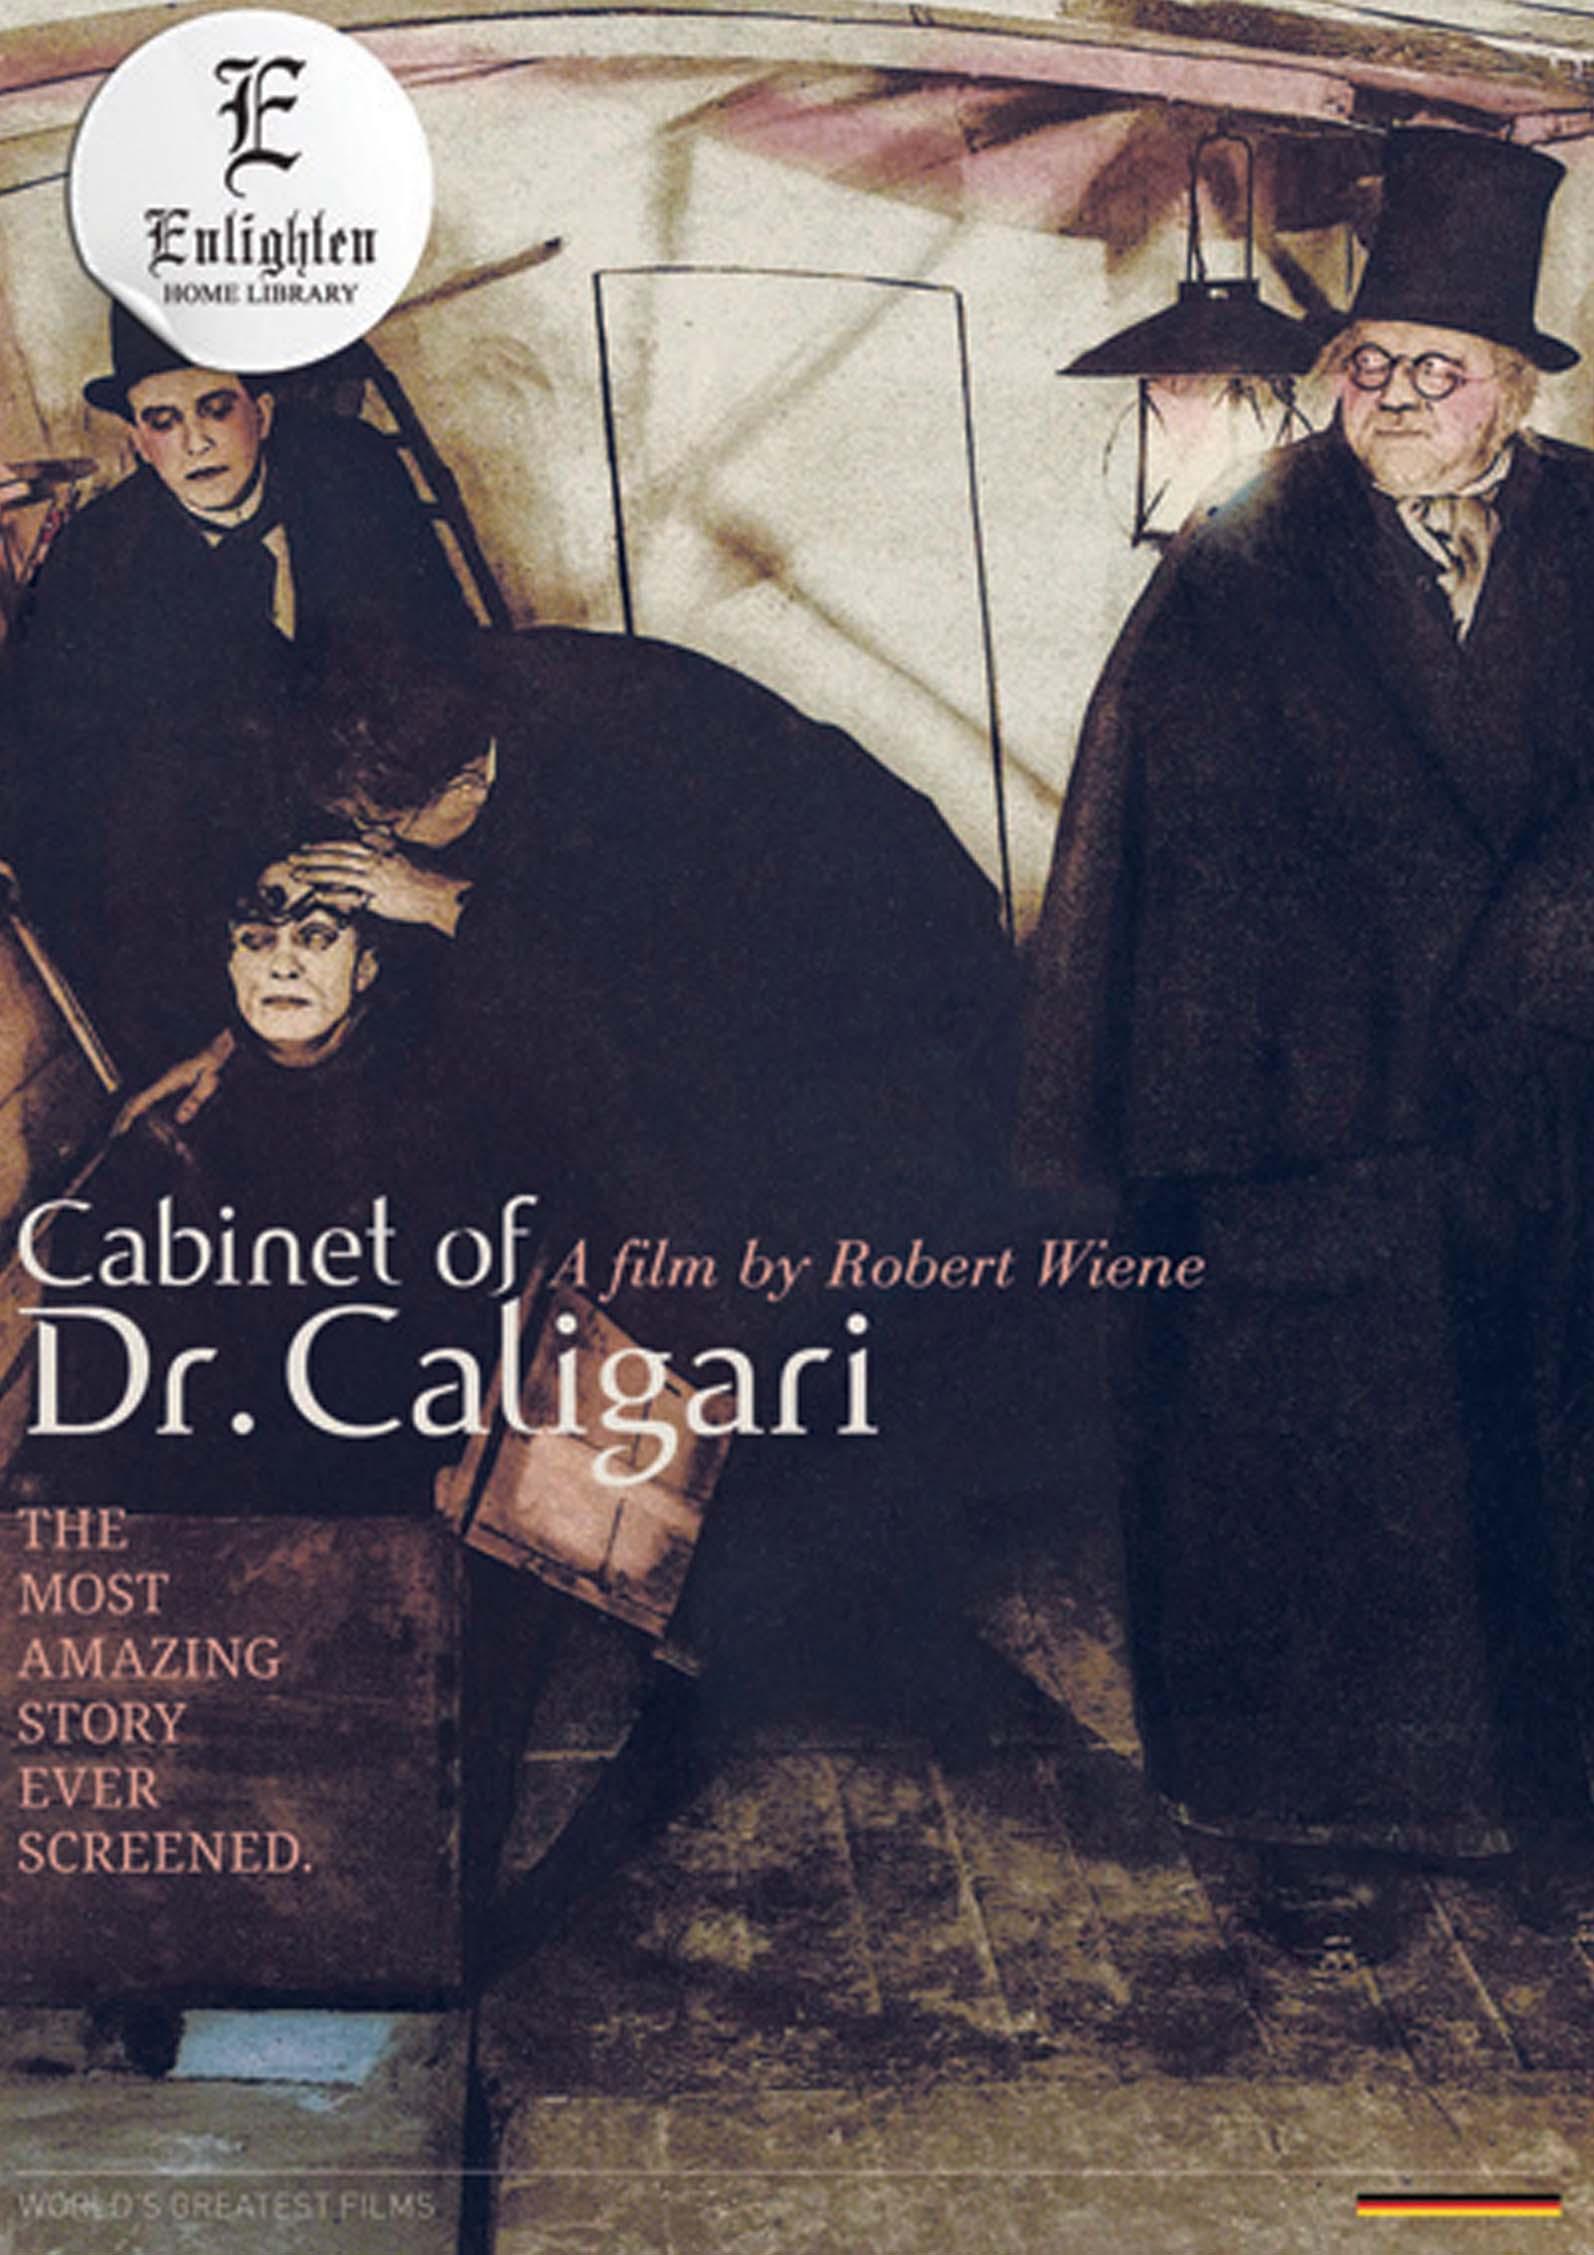 CabinetOfDr.Calligari.jpg